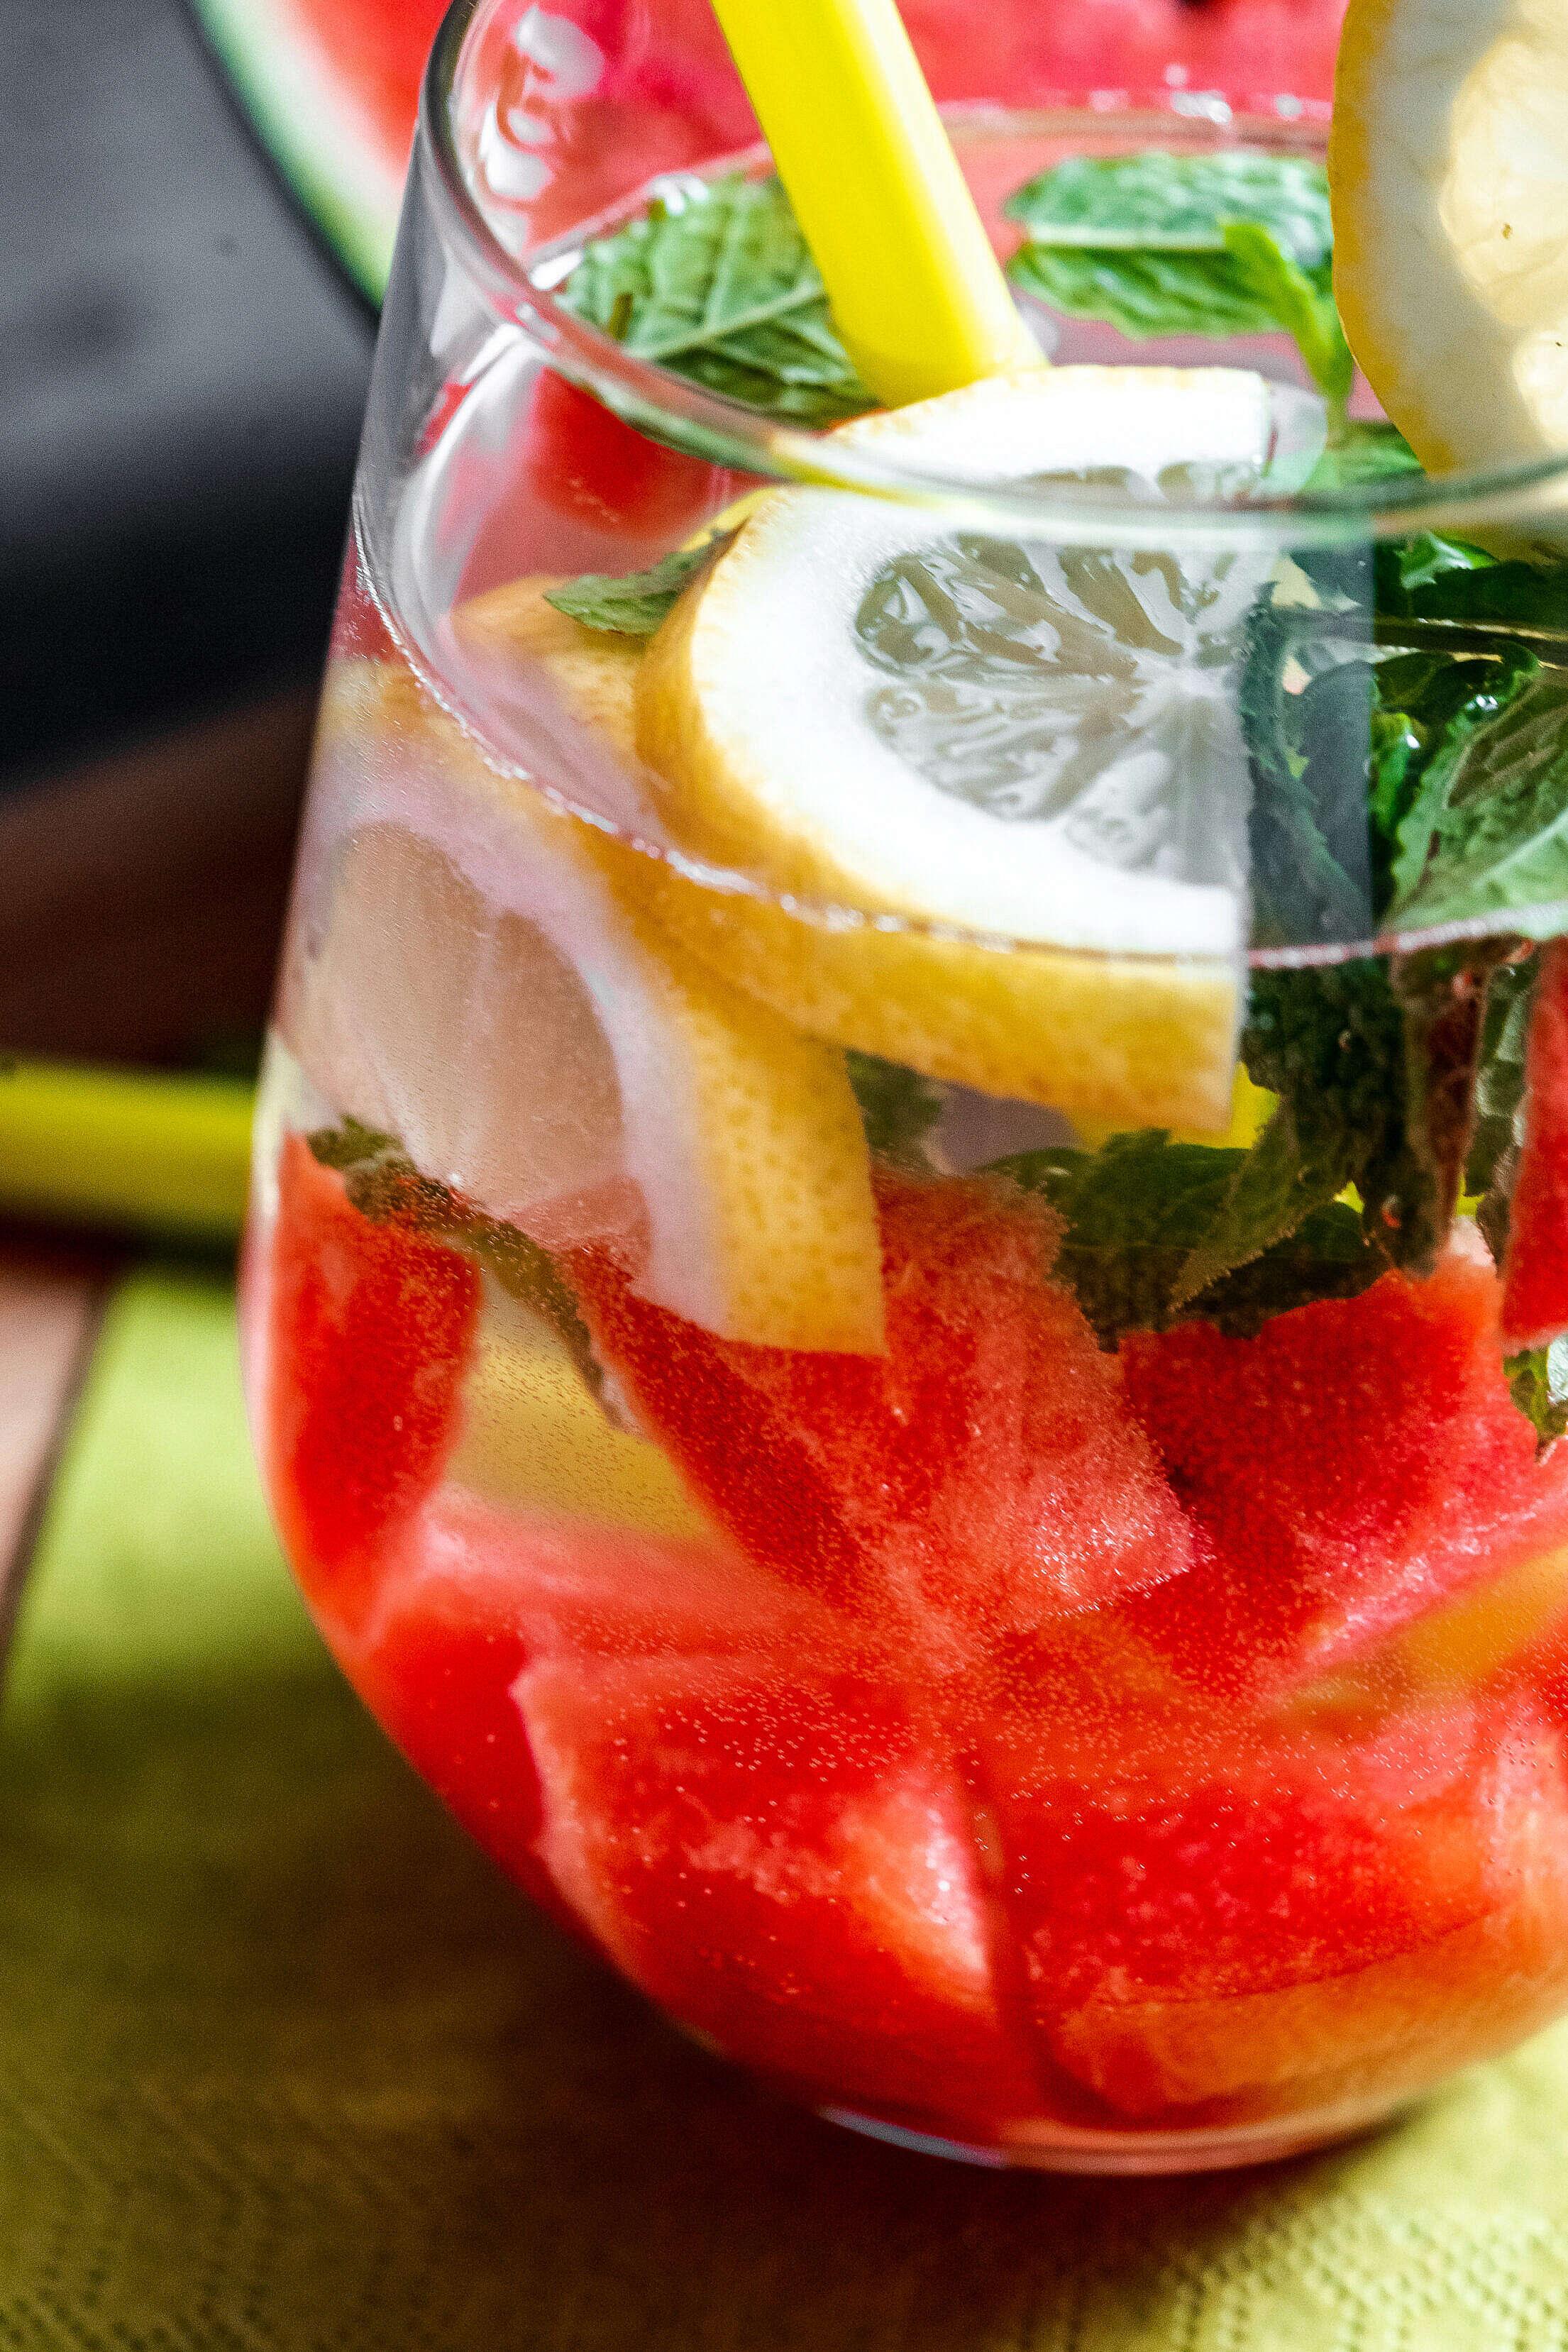 Summer Melon Lemonade Free Stock Photo